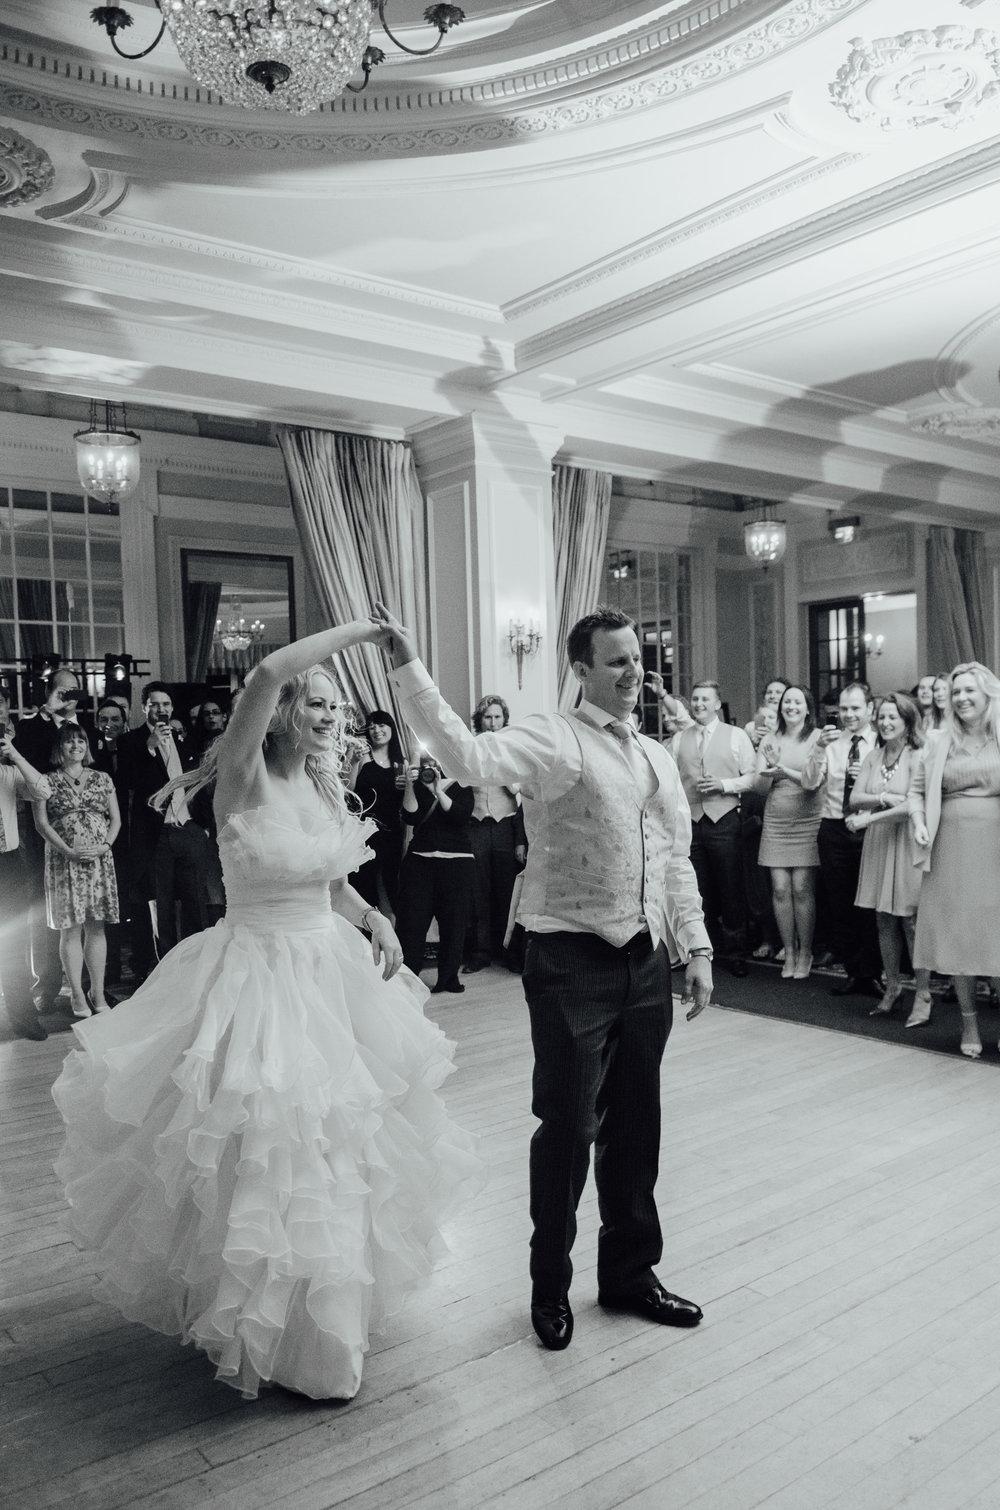 cleland-studios-wedding-photography-79.jpg